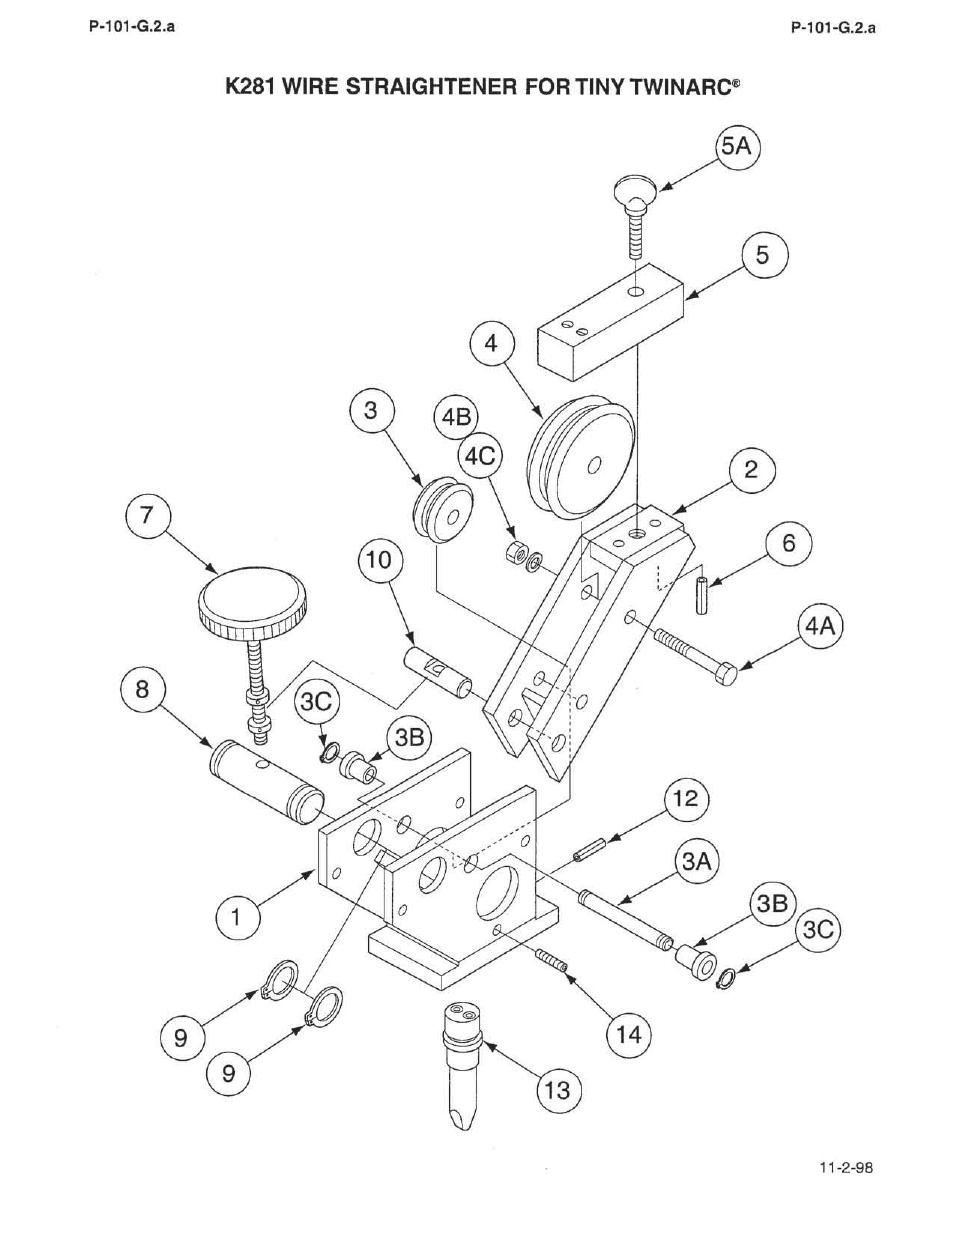 ✦diagram based✦ mitsubishi tractor d3000 schematics completed diagram base d3000  schematics - jonathan.clements.eardiagram.pcinformi.it  diagram based completed edition - pcinformi